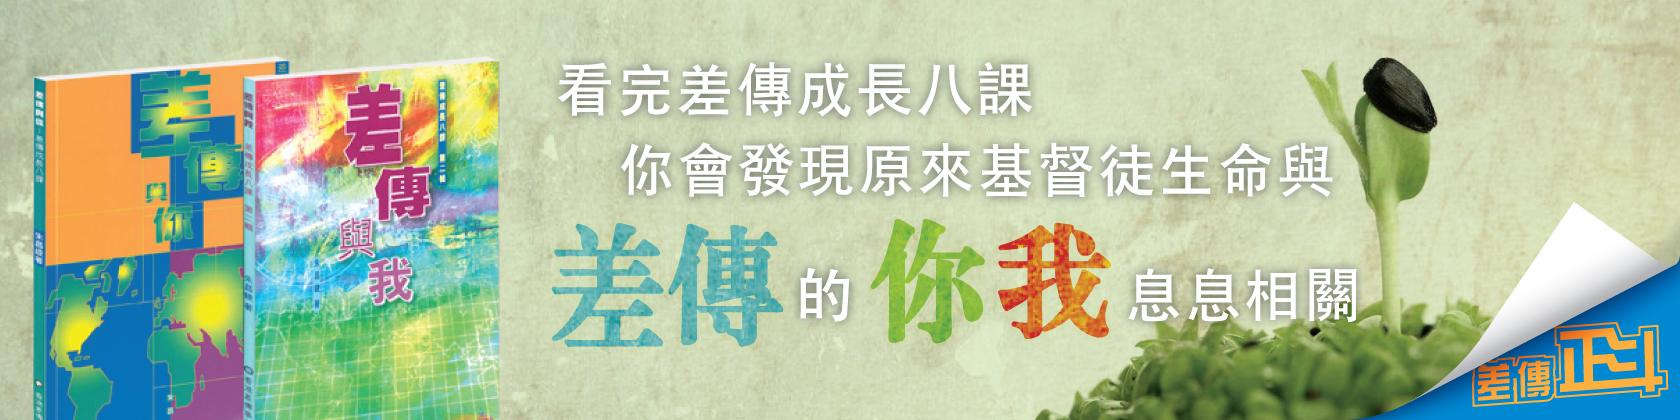 CB-01-web-banner-1680-x-420-B2-05